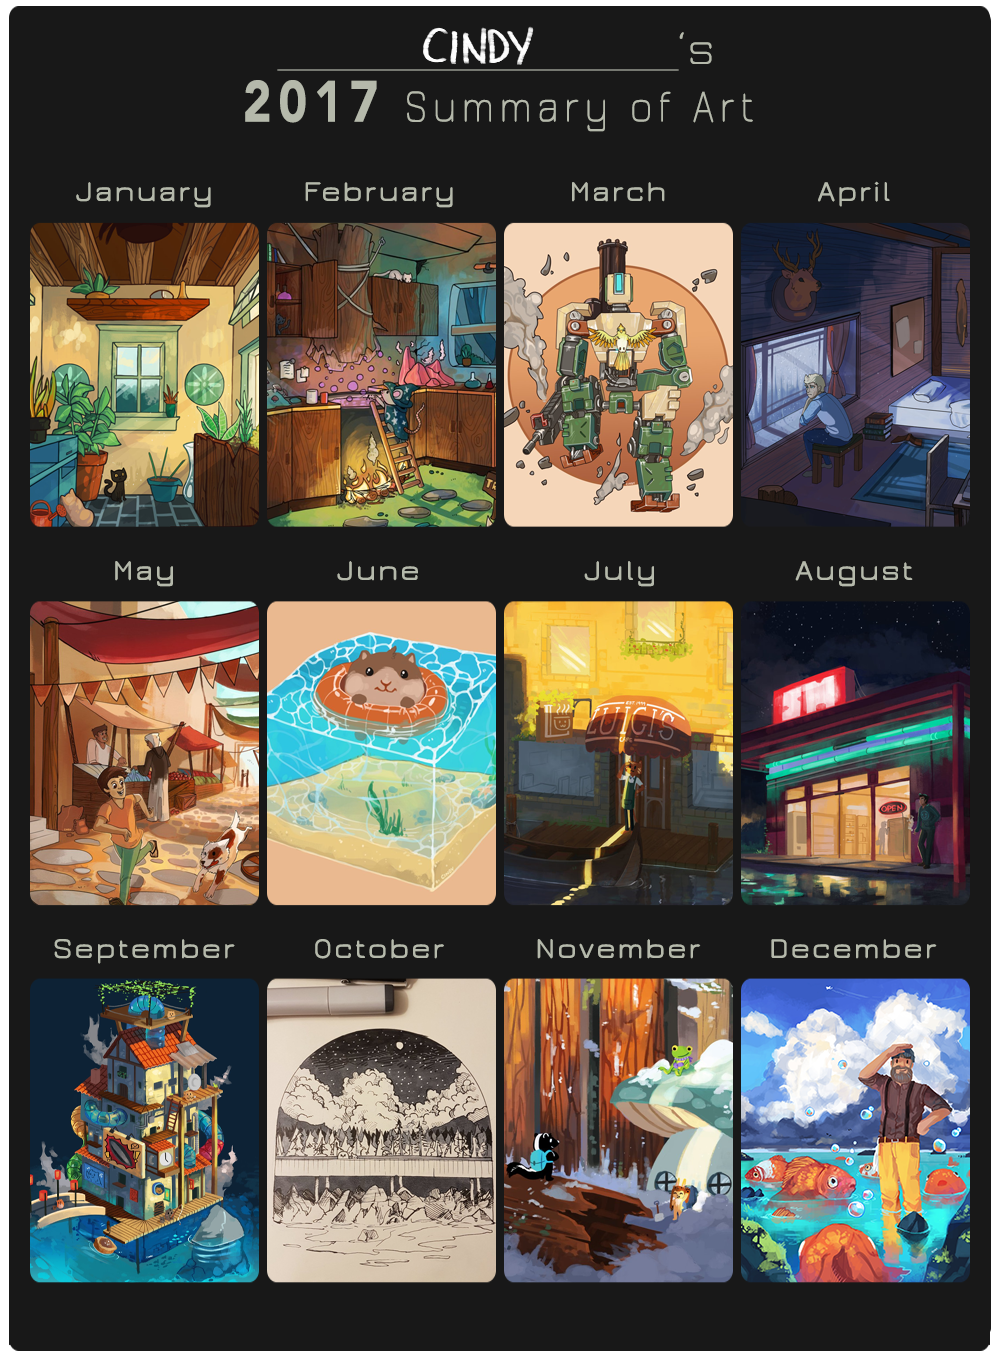 2017 Summary of Art by MugiwaraWolf